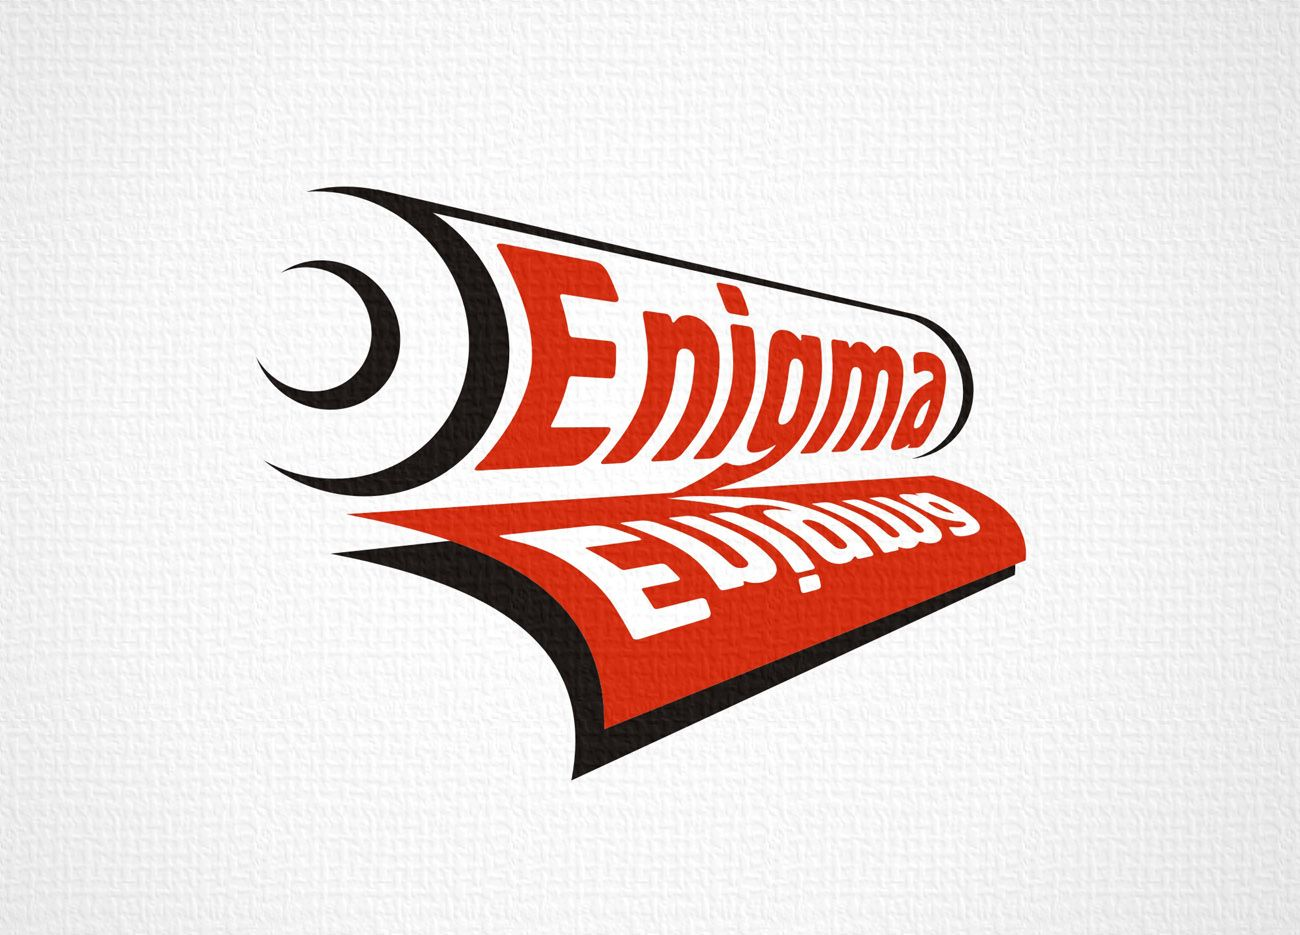 Логотип и фирмстиль для Enigma - дизайнер Zheravin